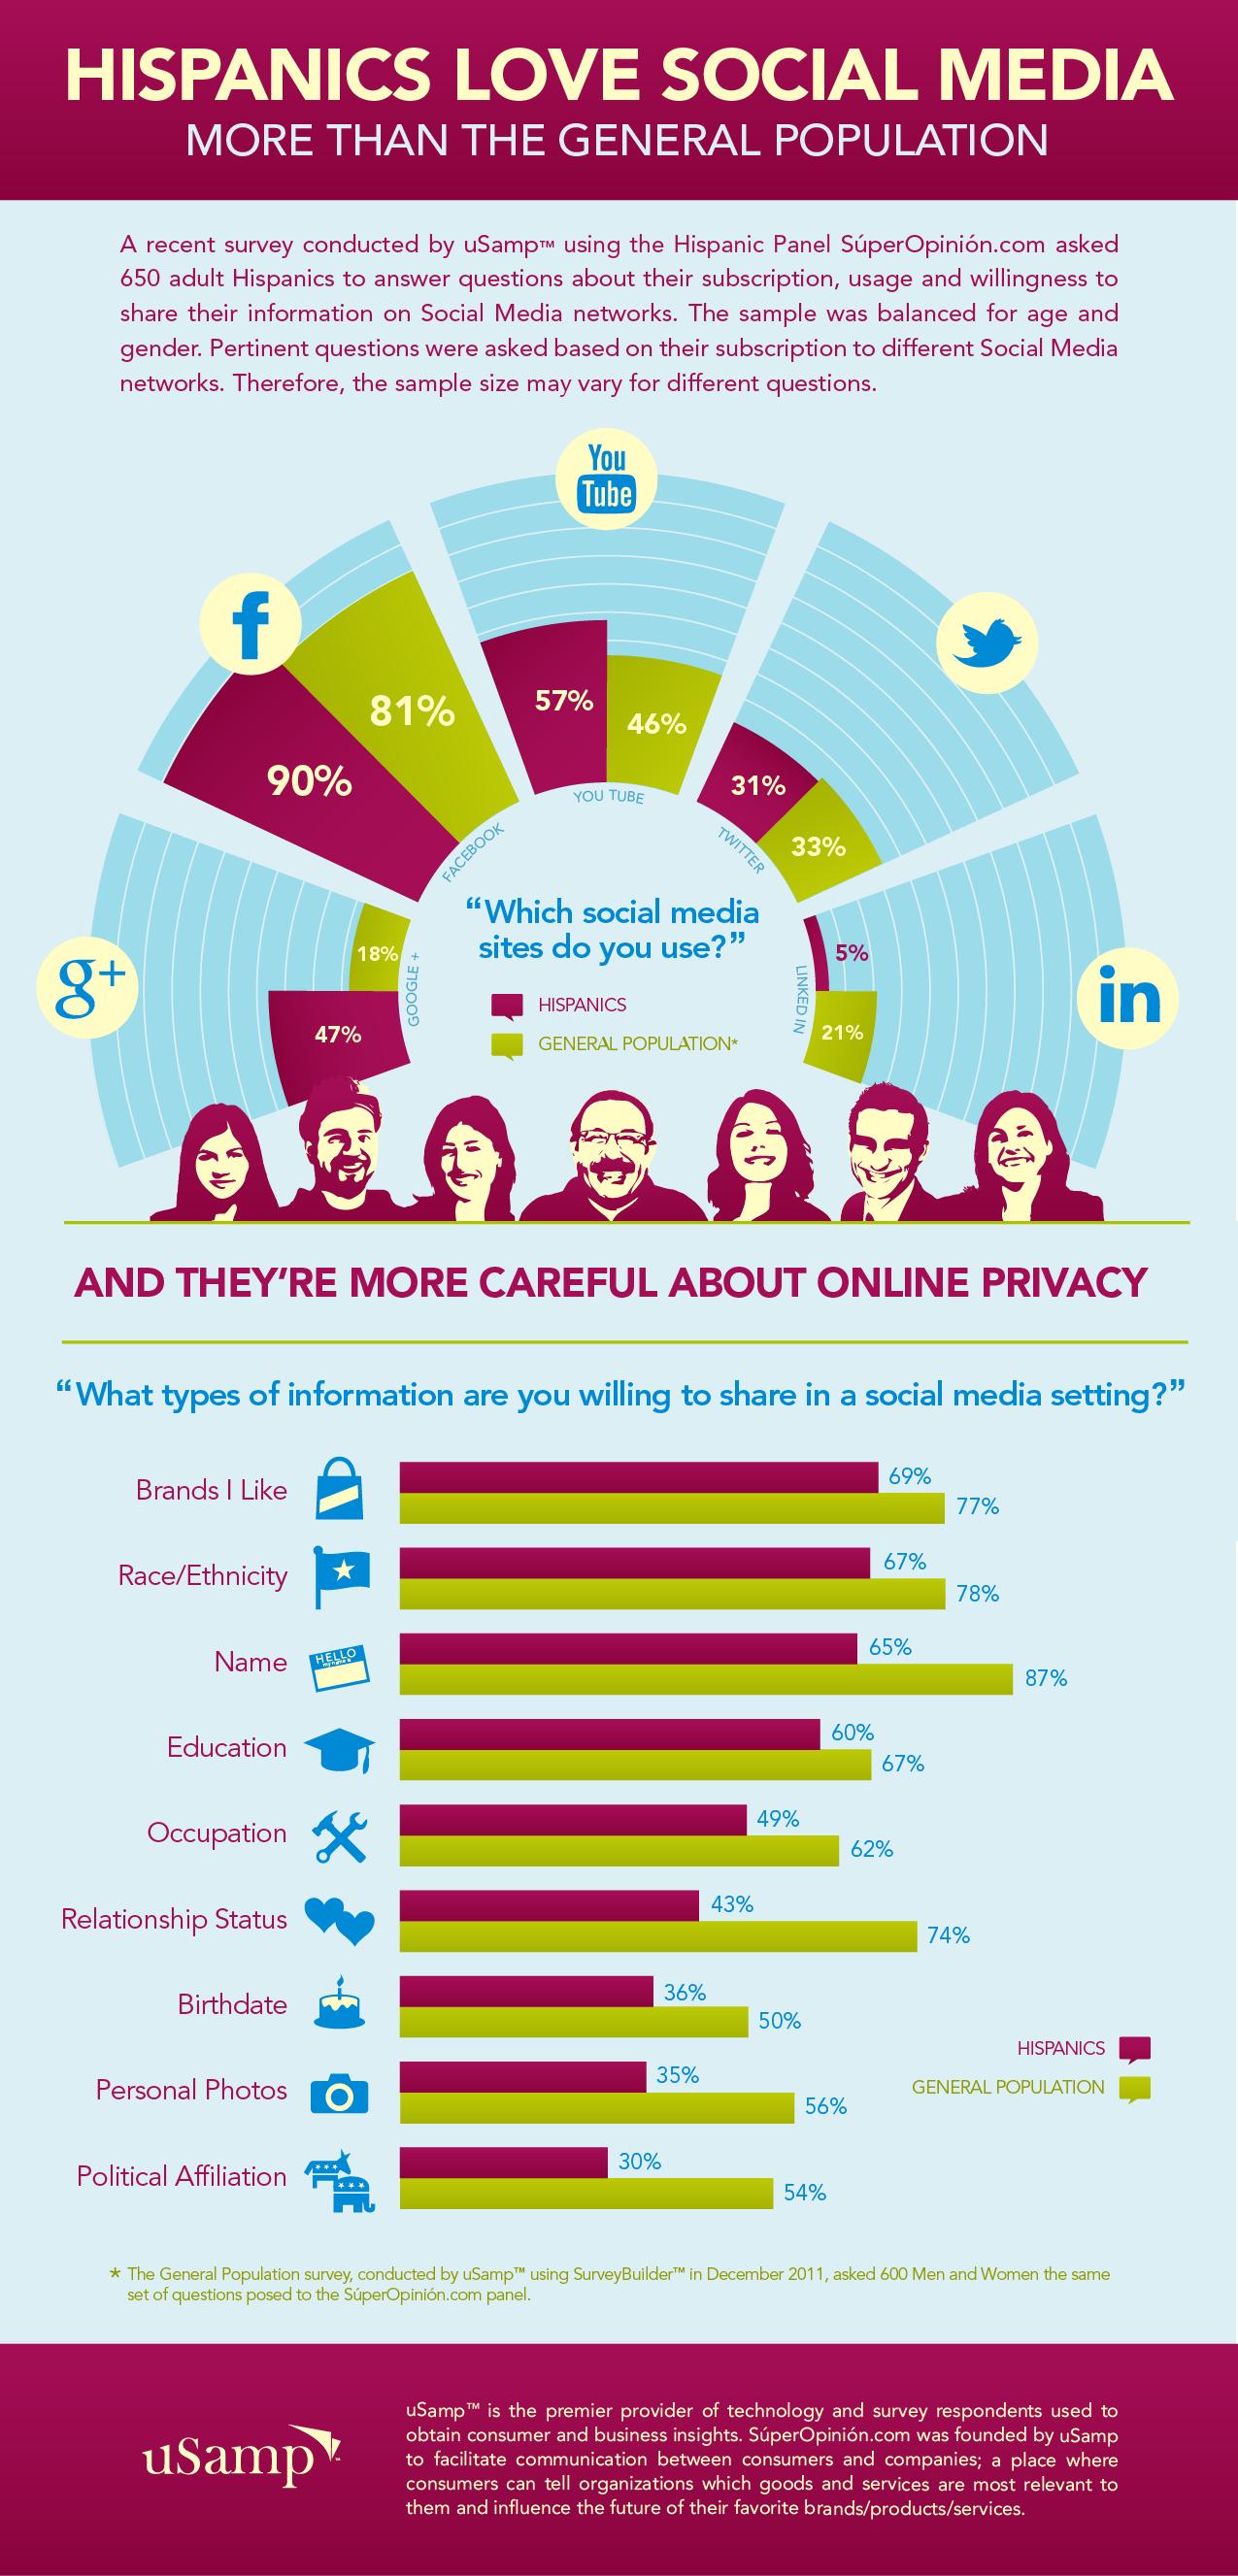 Hispanic Social Media Habits & Privacy Concerns Study [INFOGRAPHIC]